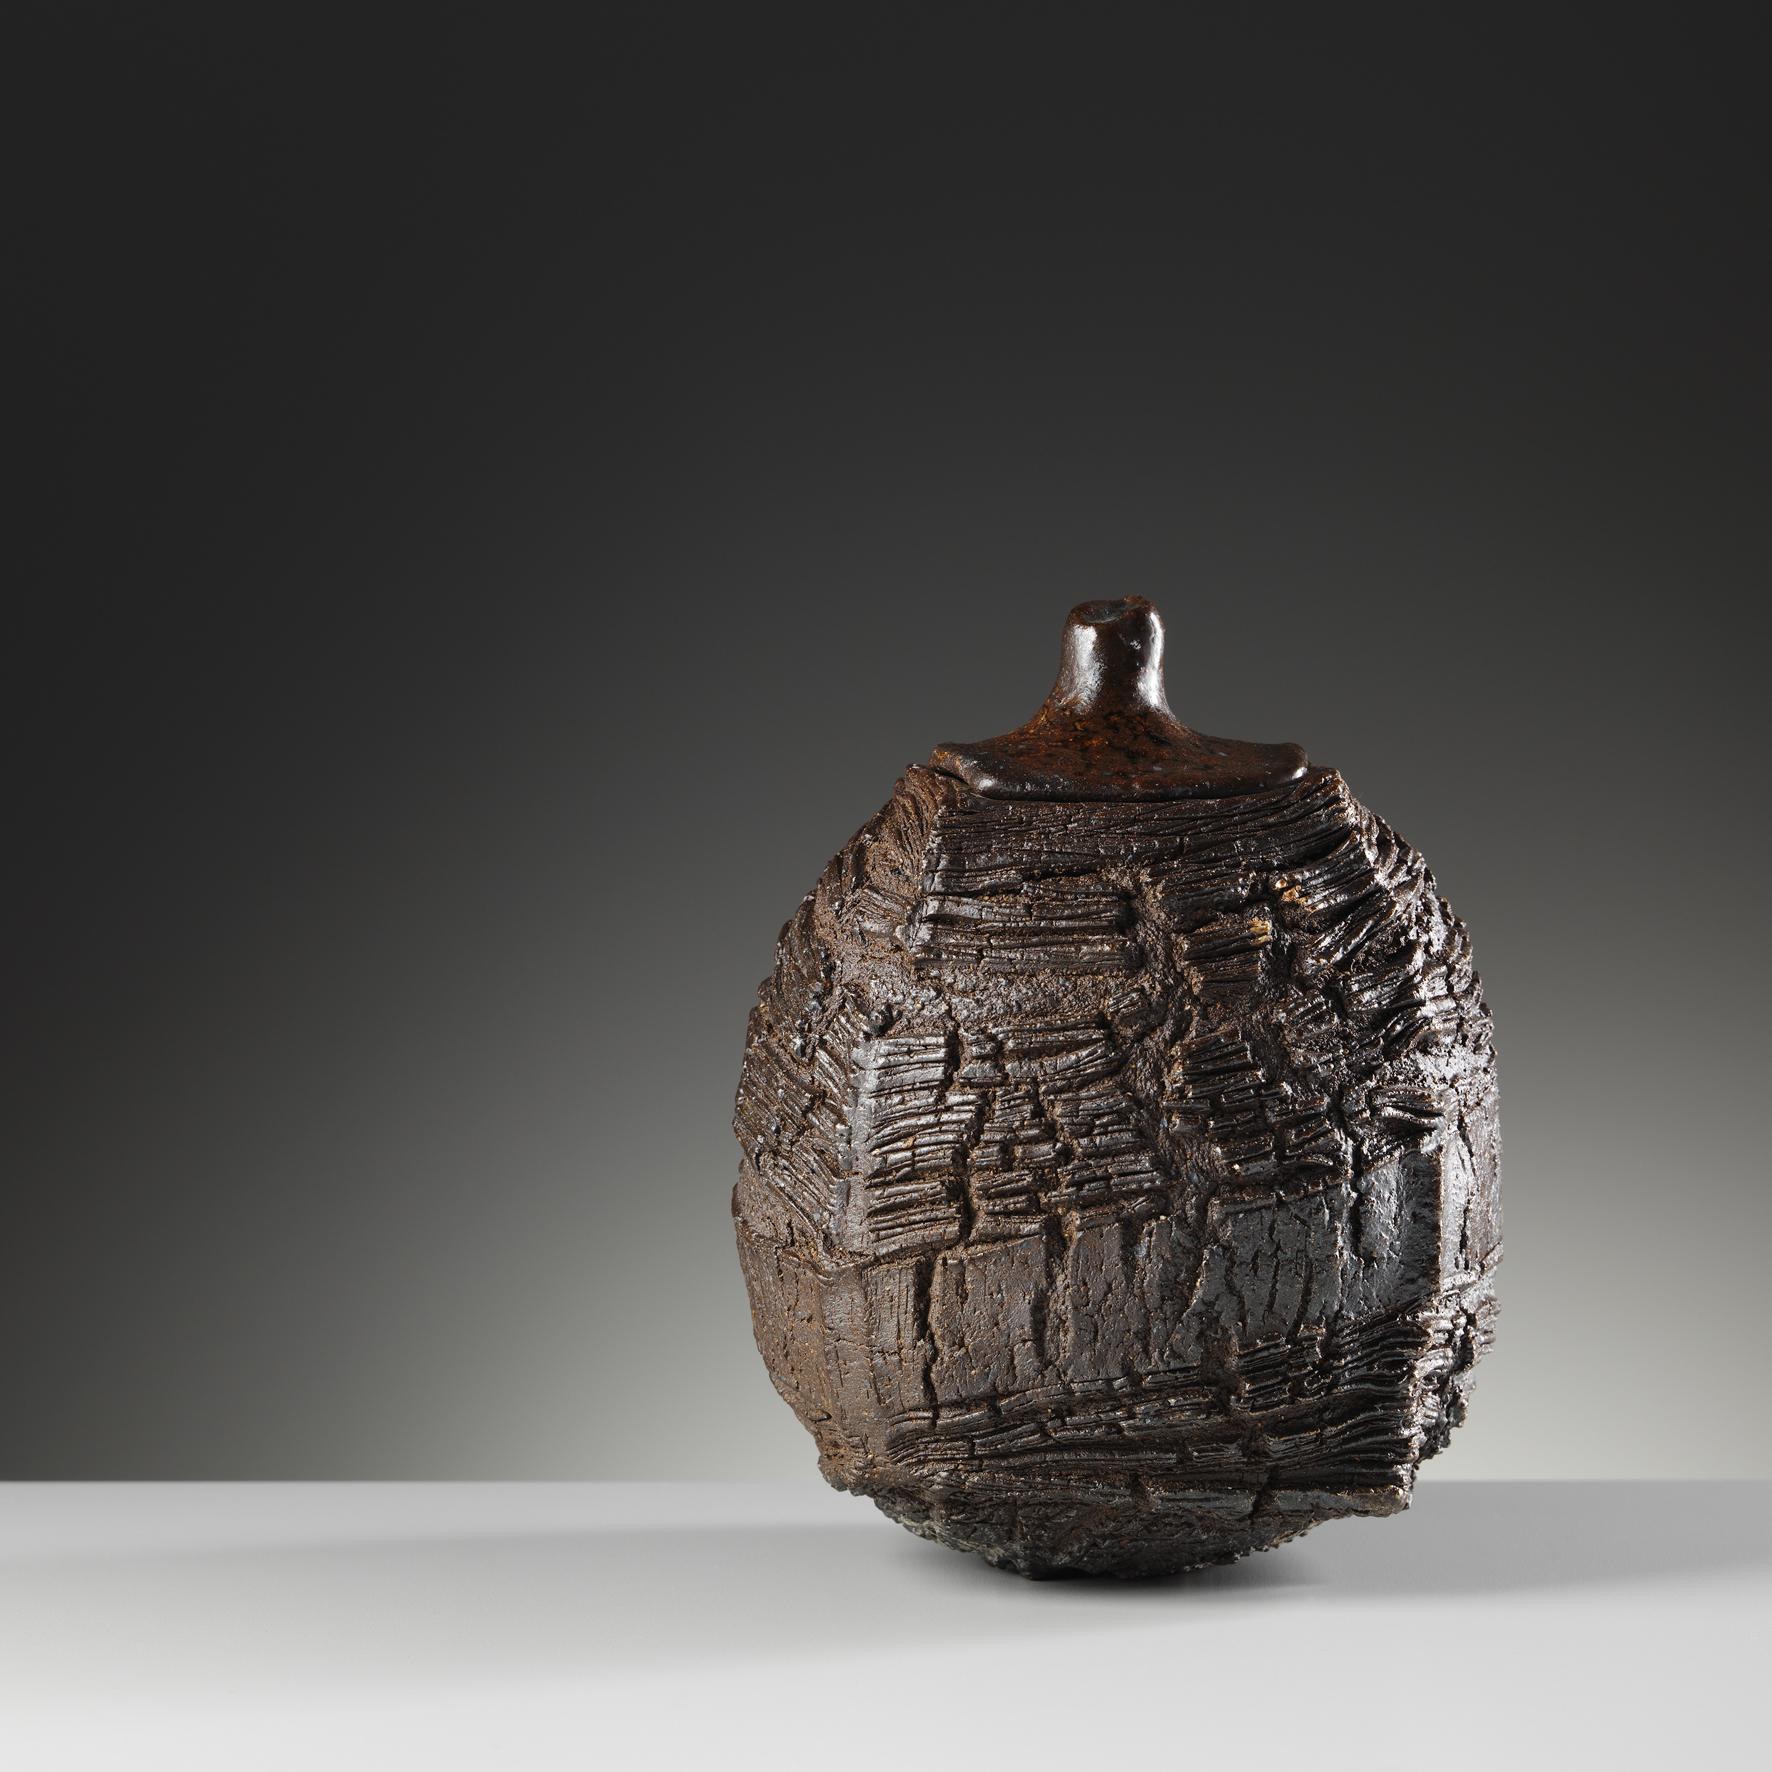 Lidded Erosion Jar